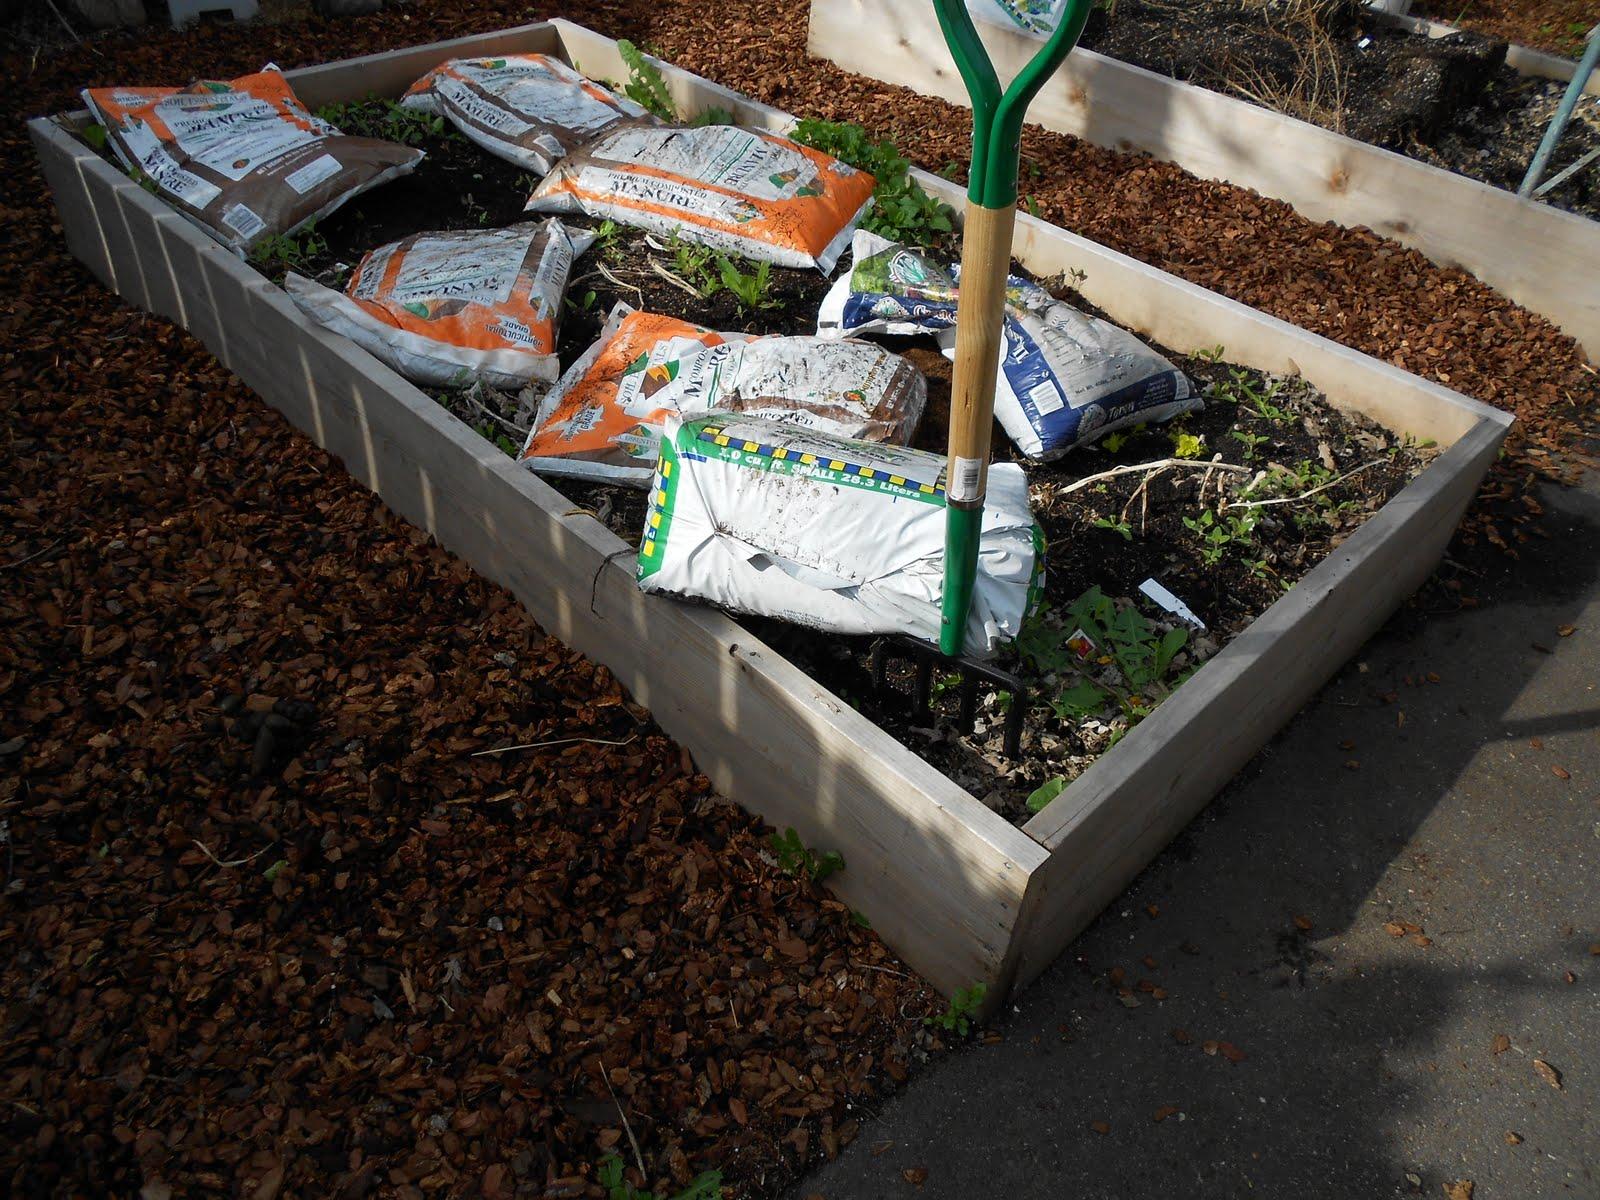 Arts and flowers mn planting a vegetable garden - Best vegetable garden soil amendments ...